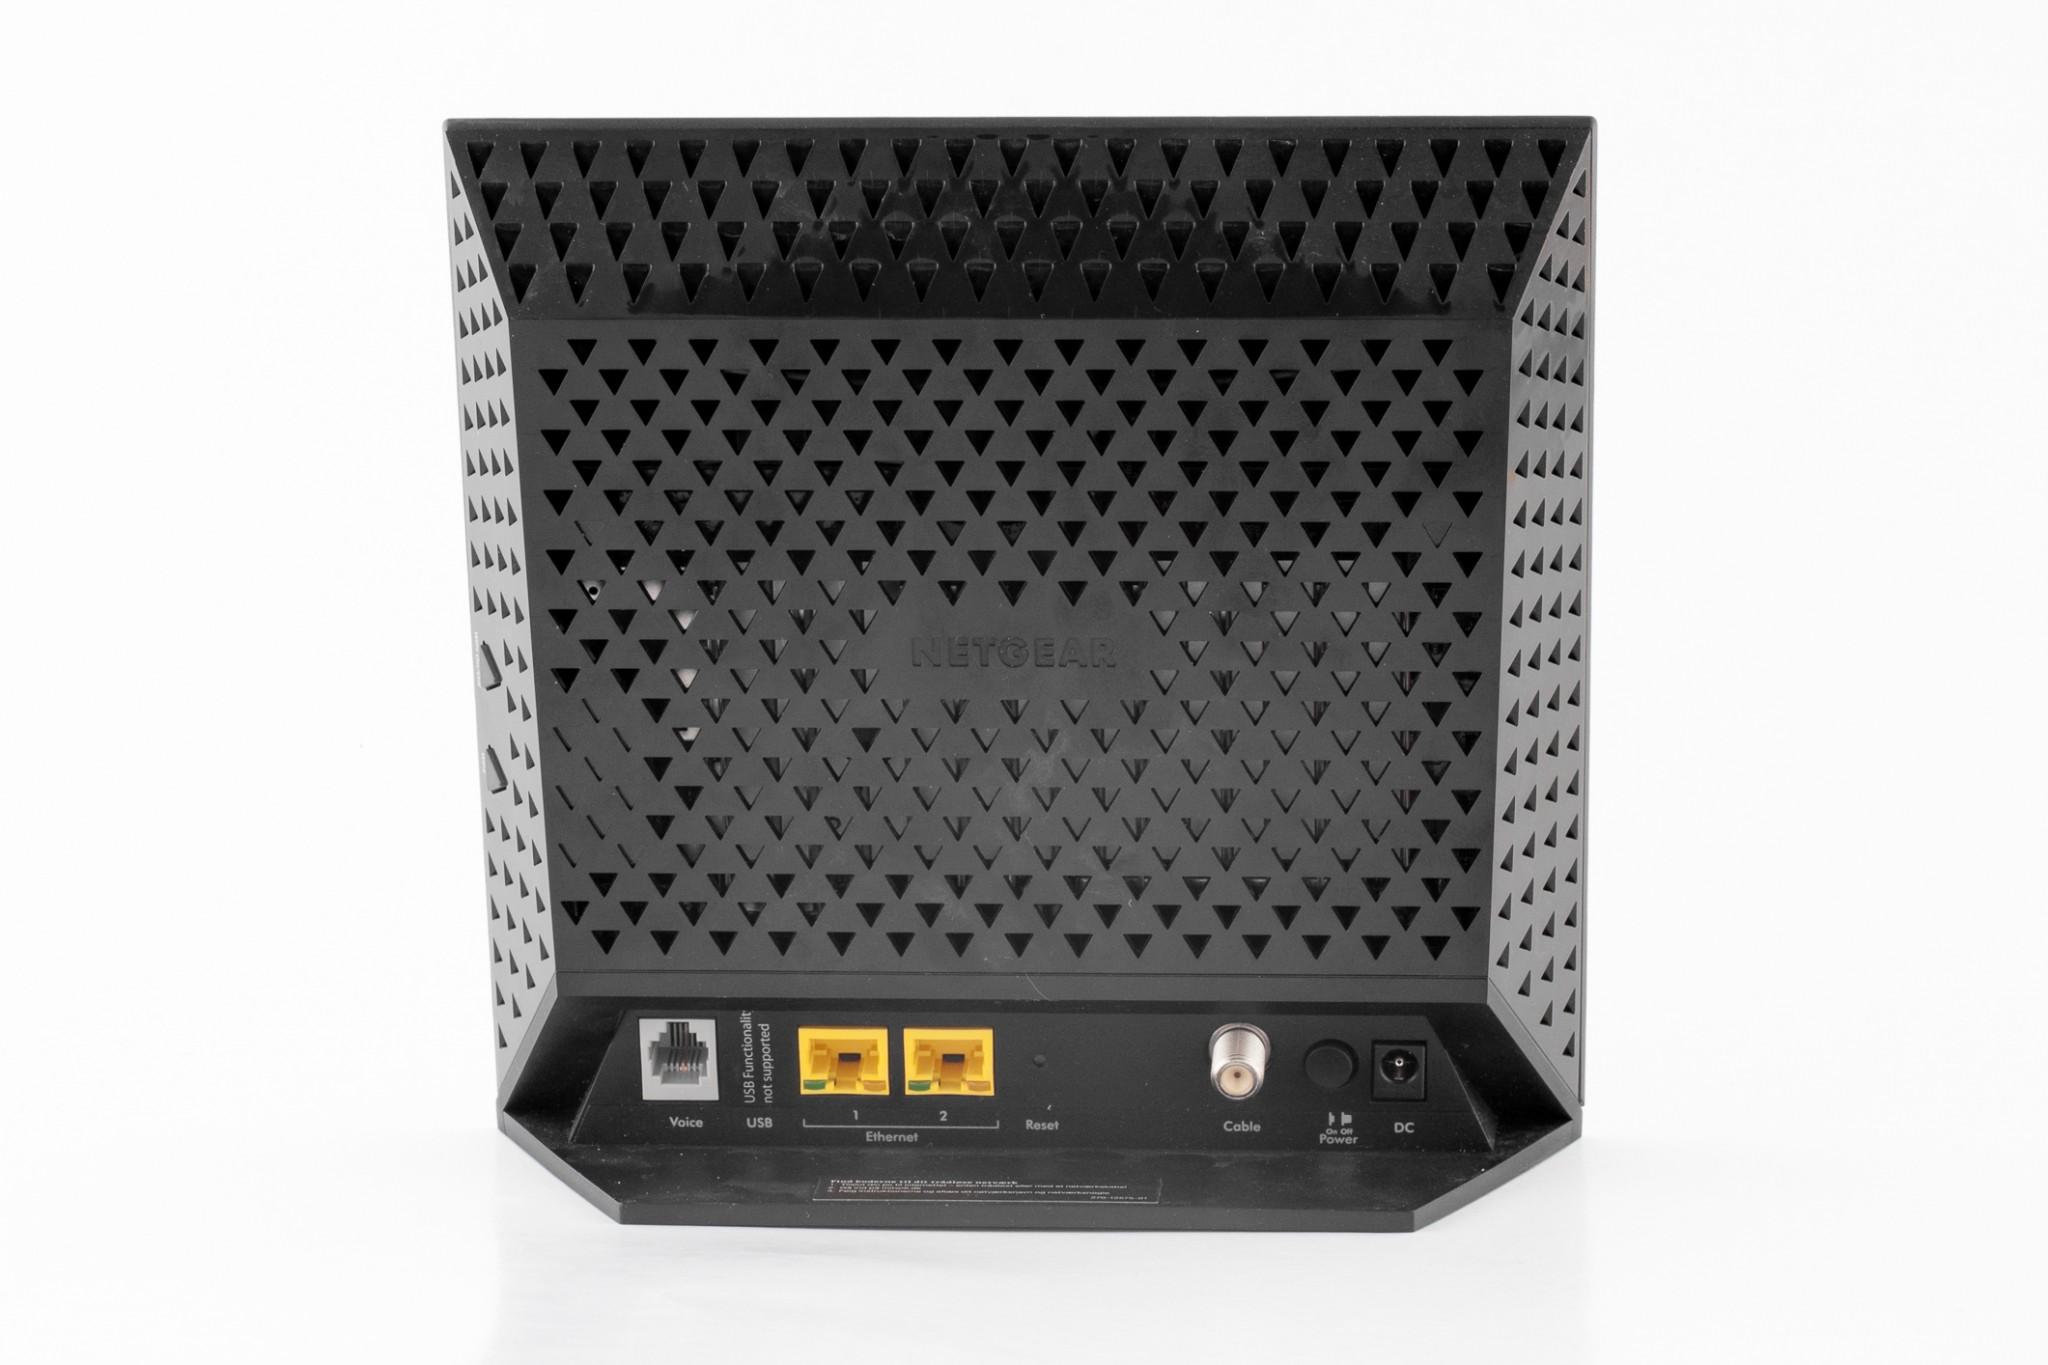 Netgear C6250emr Docsis 3 0 Ac1600 Voice And Data Cable